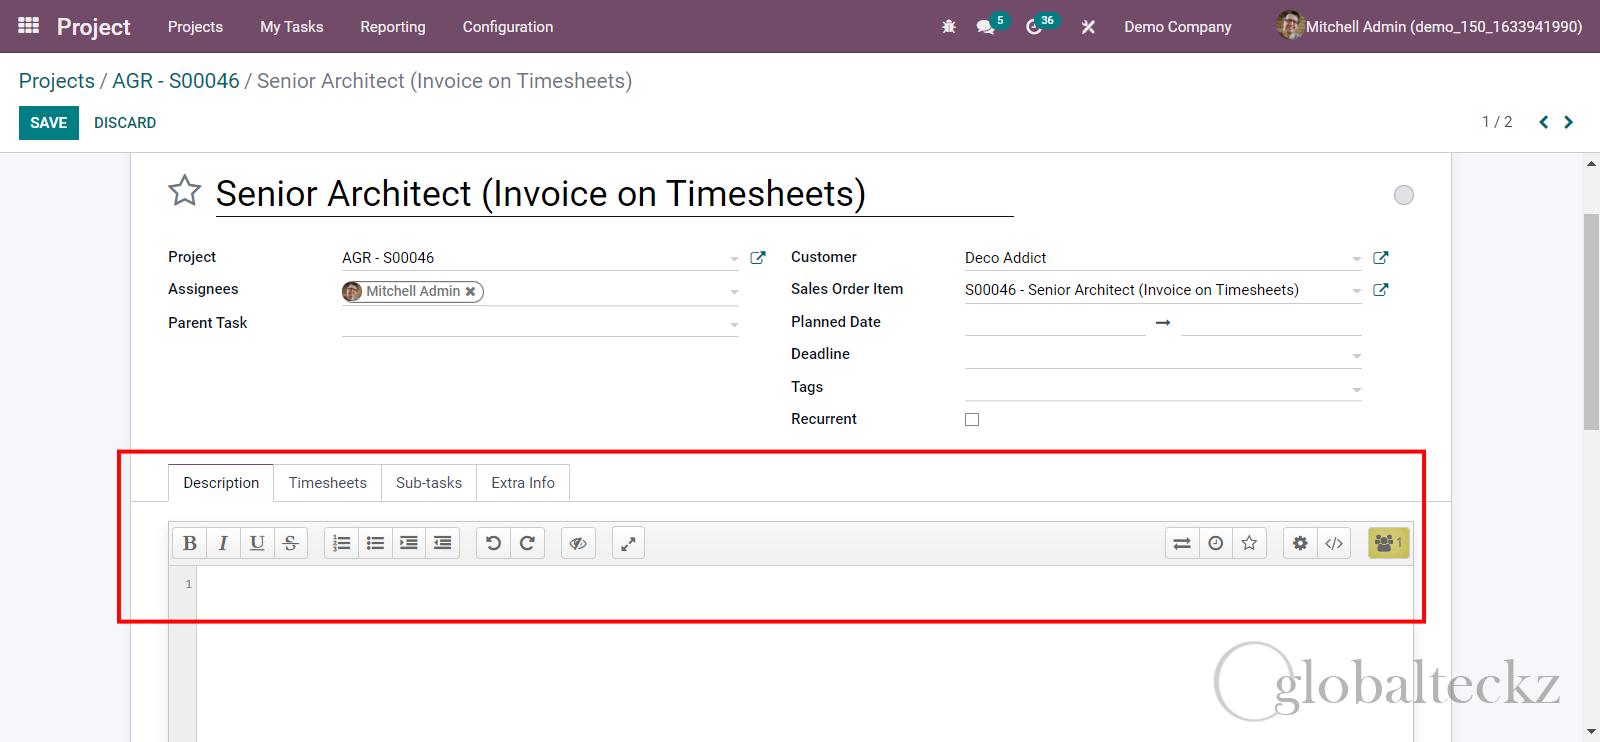 odoo 15 Launch New HTML Editor